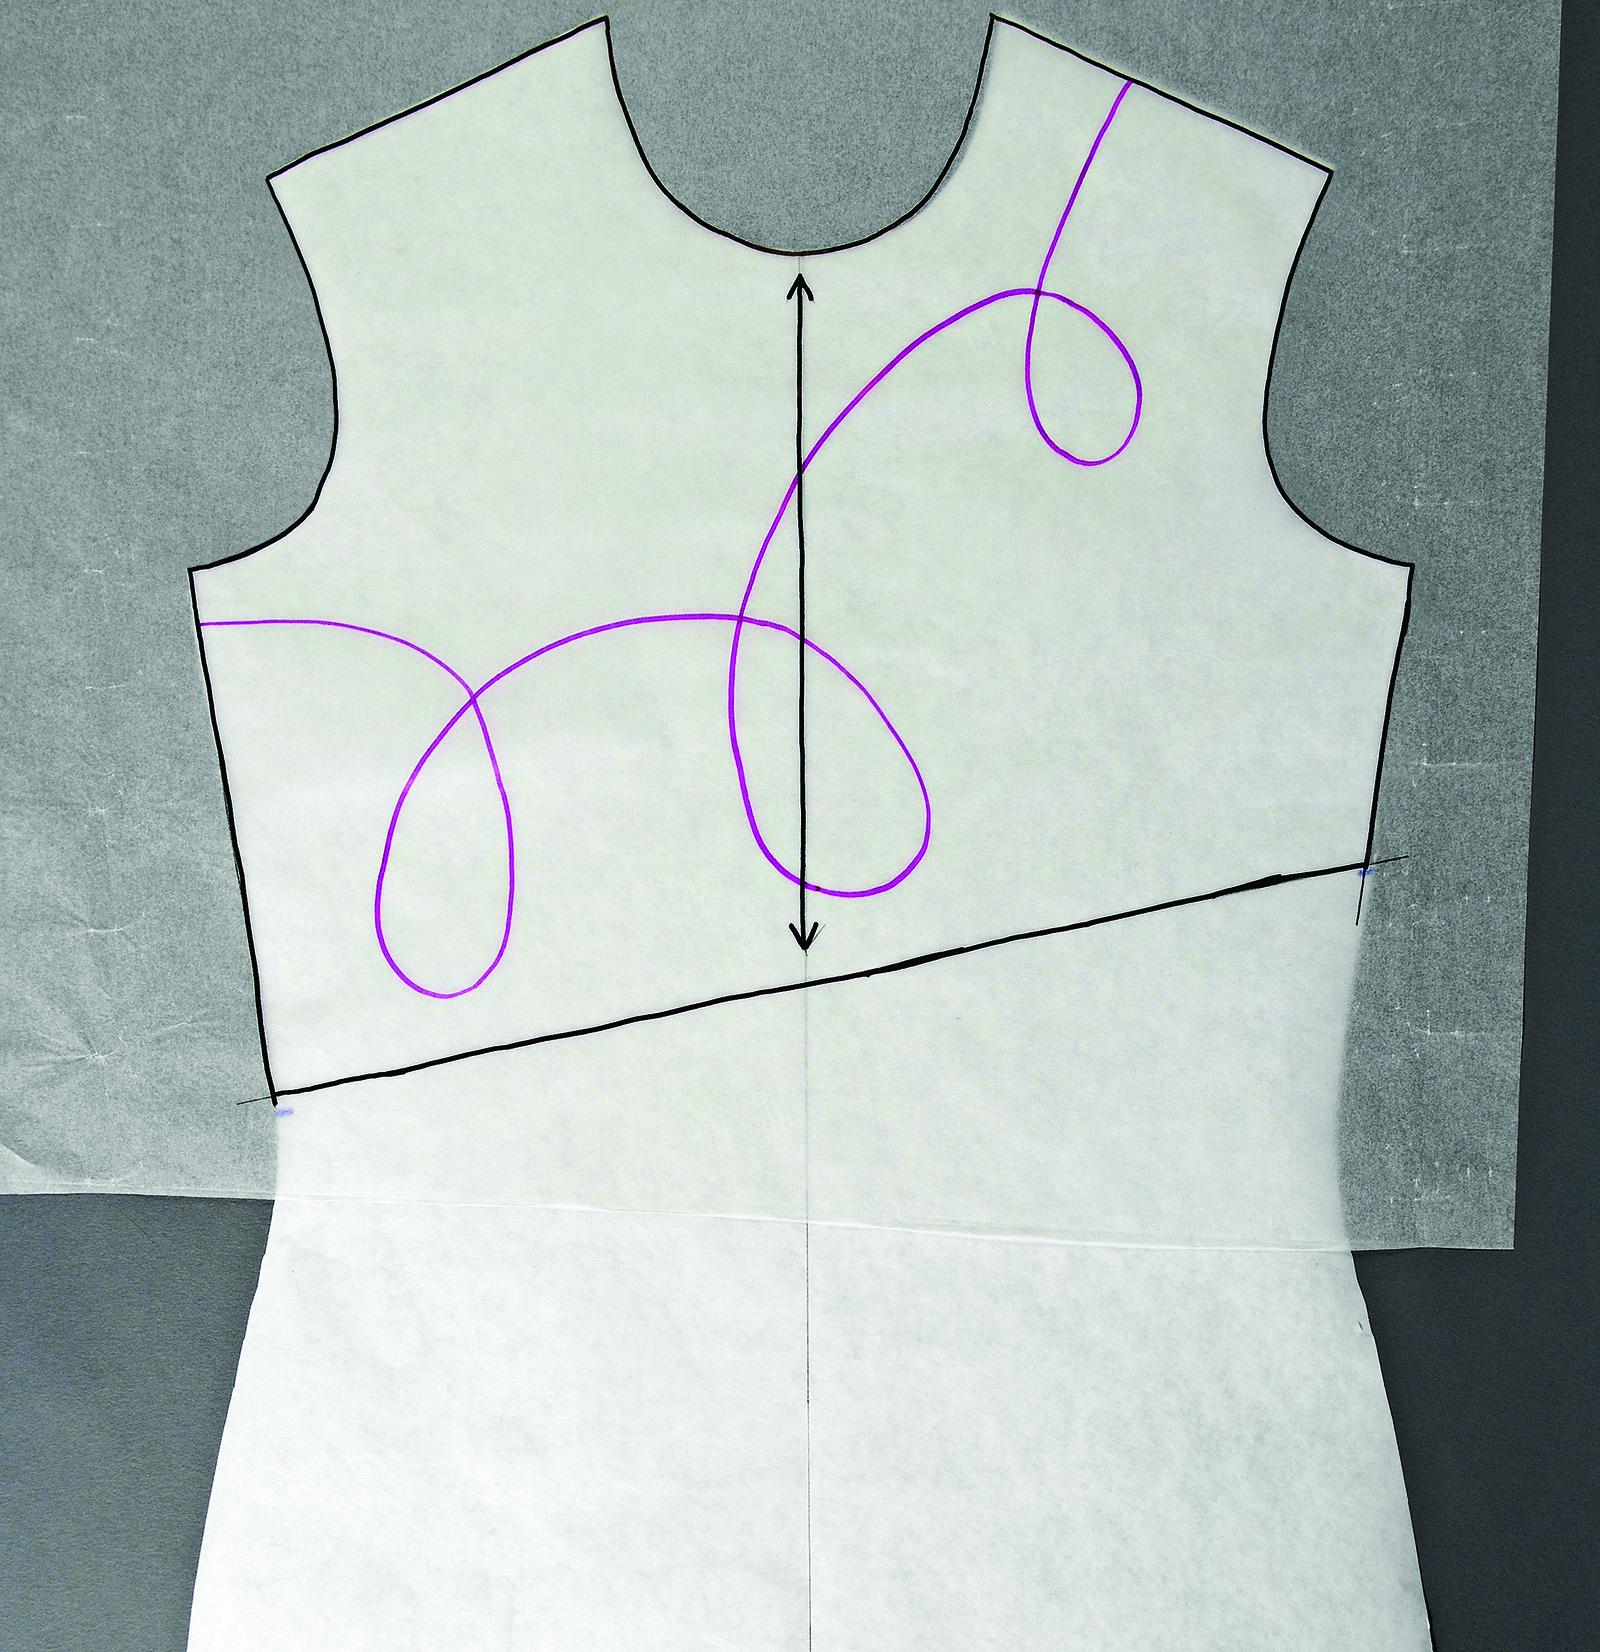 Draw the motif